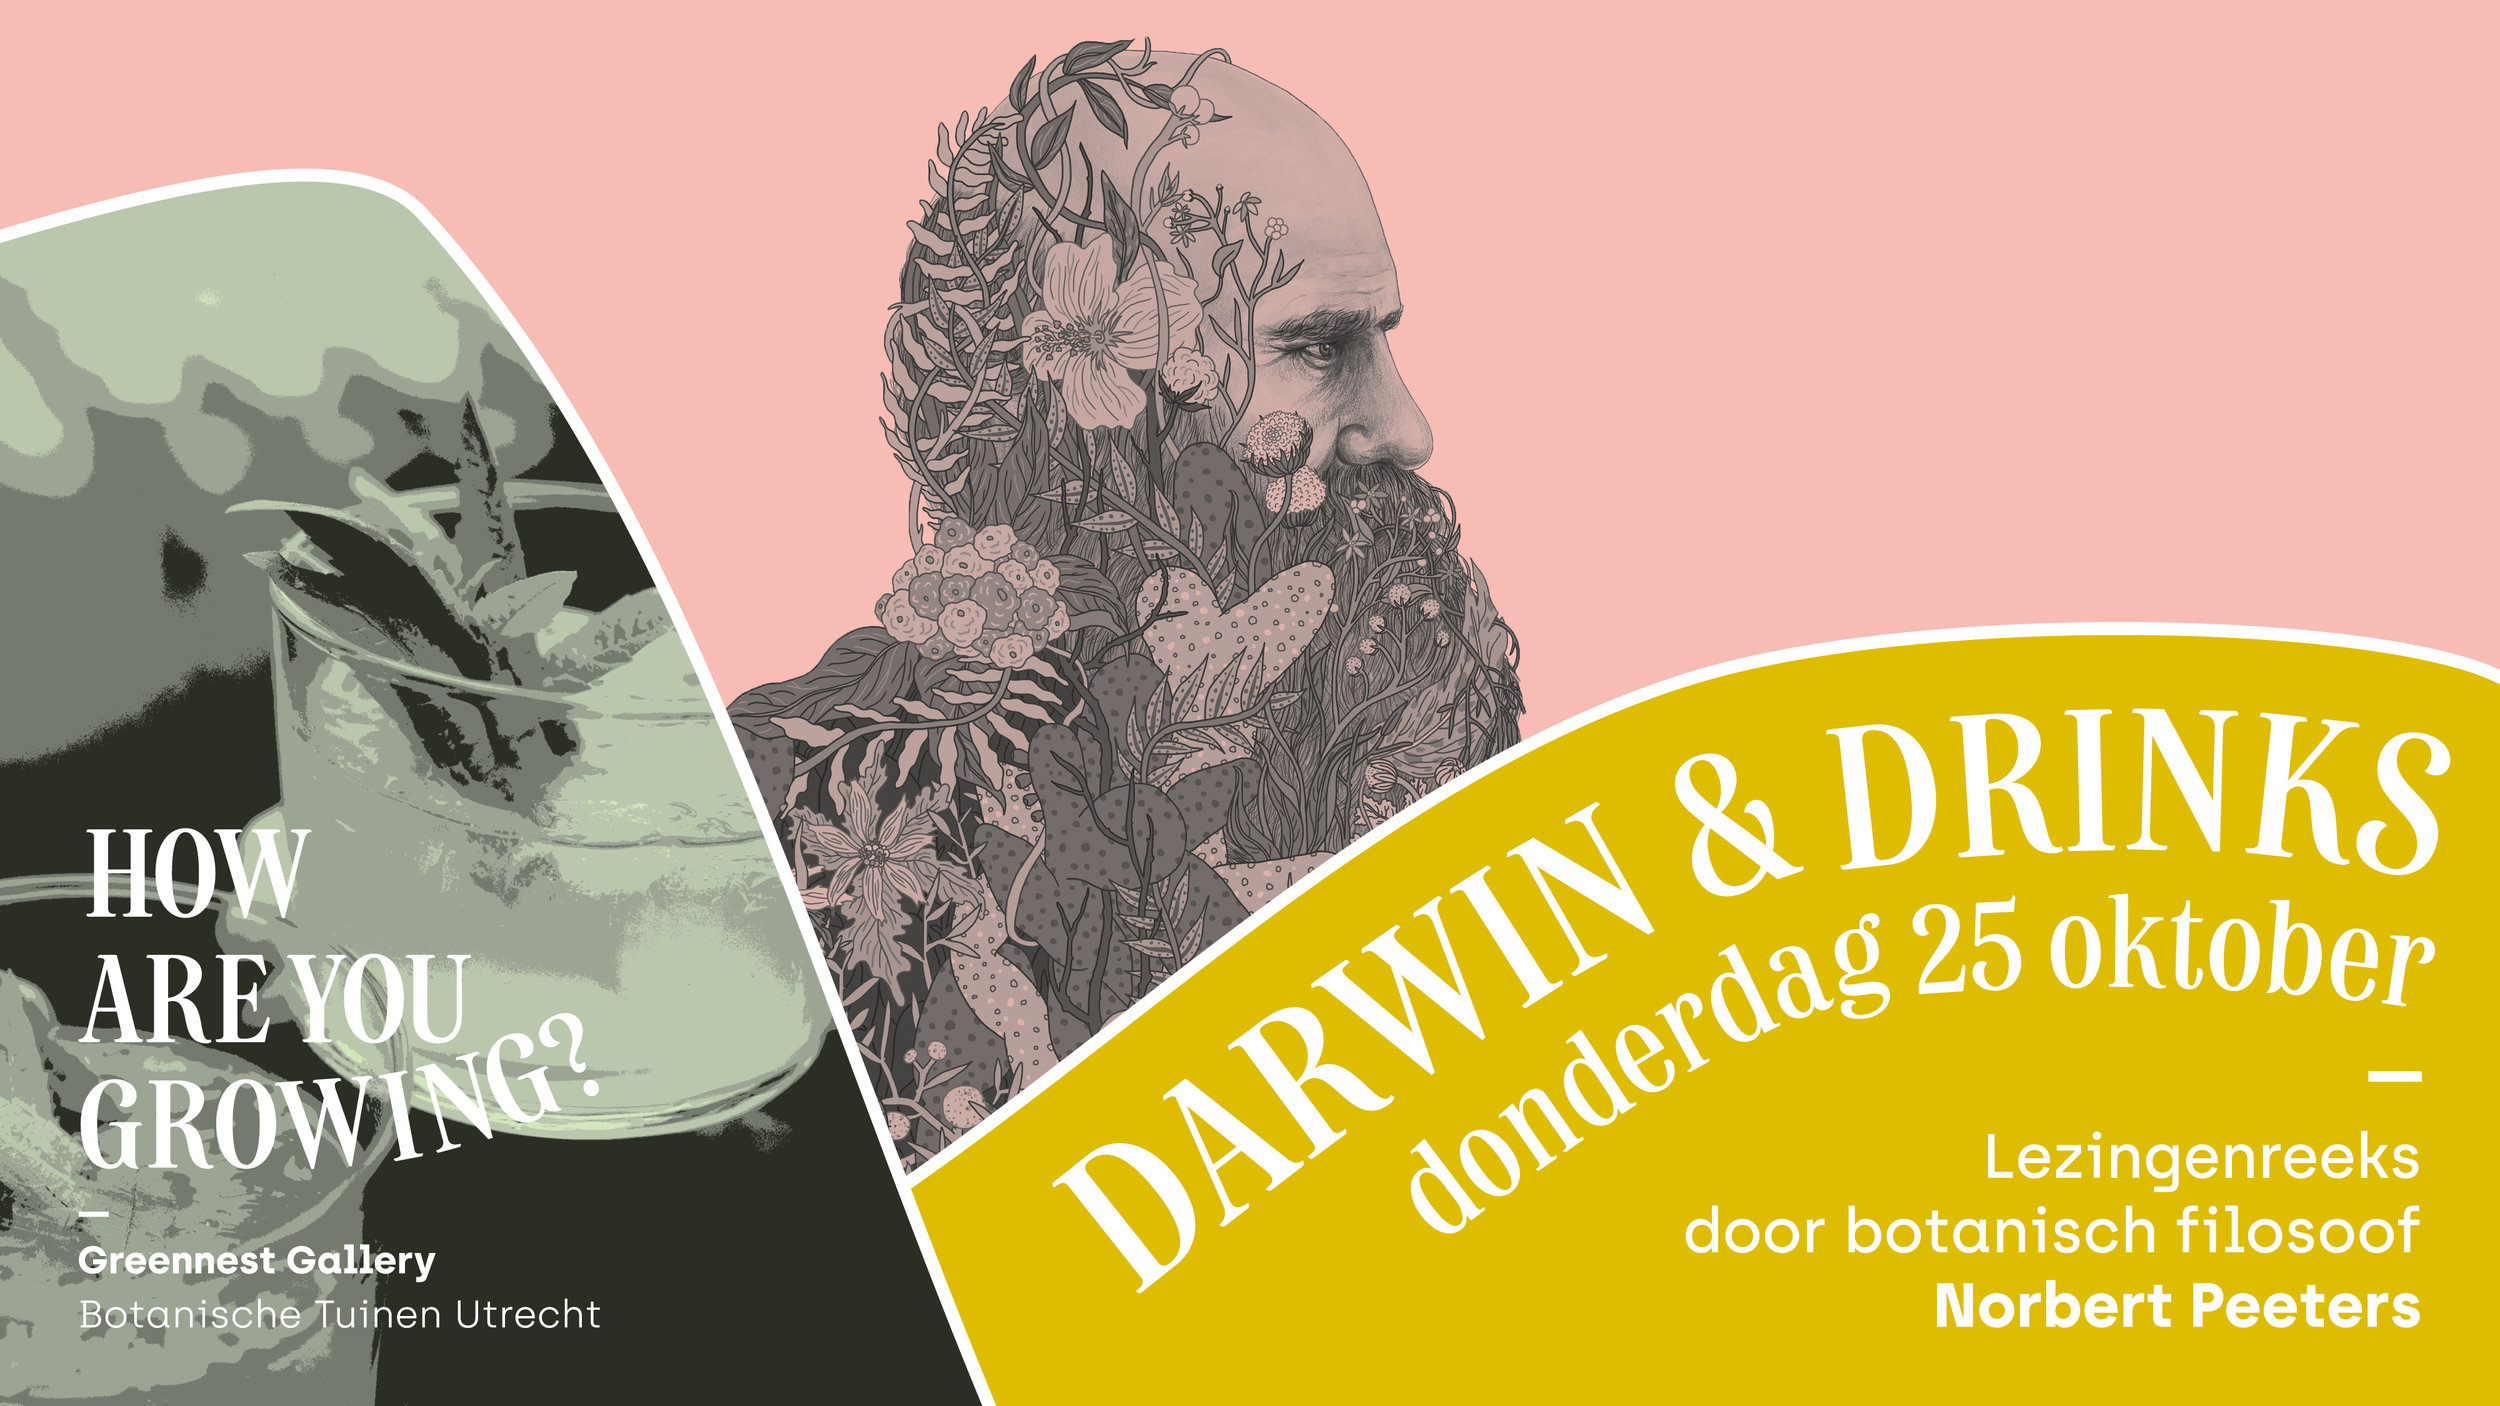 03_25okt_Darwin&Drinks_banner_150dpi.jpg